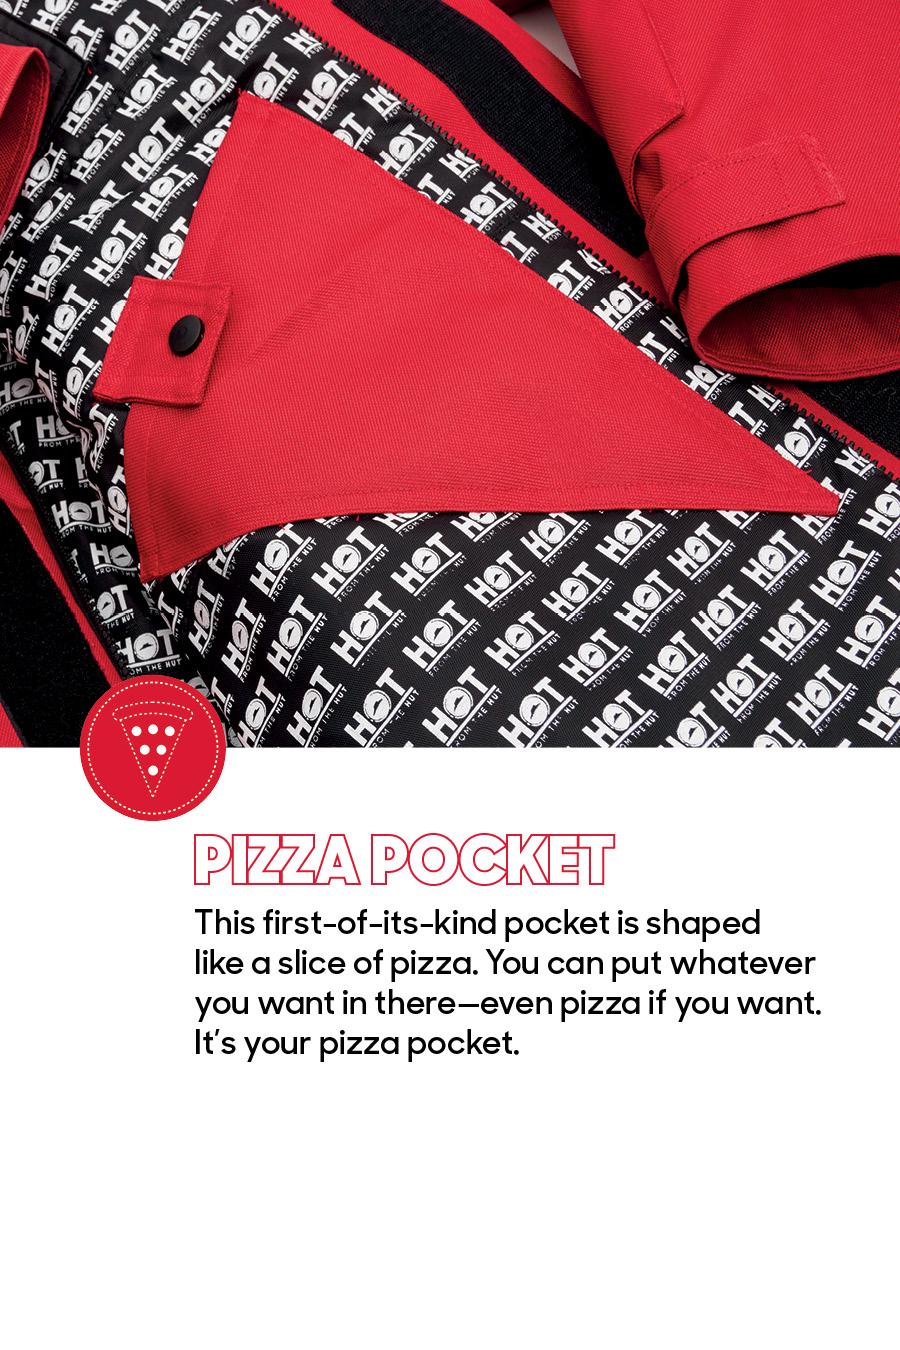 PH_PizzaParka_3x4.5_hang_tag_vF12.jpg